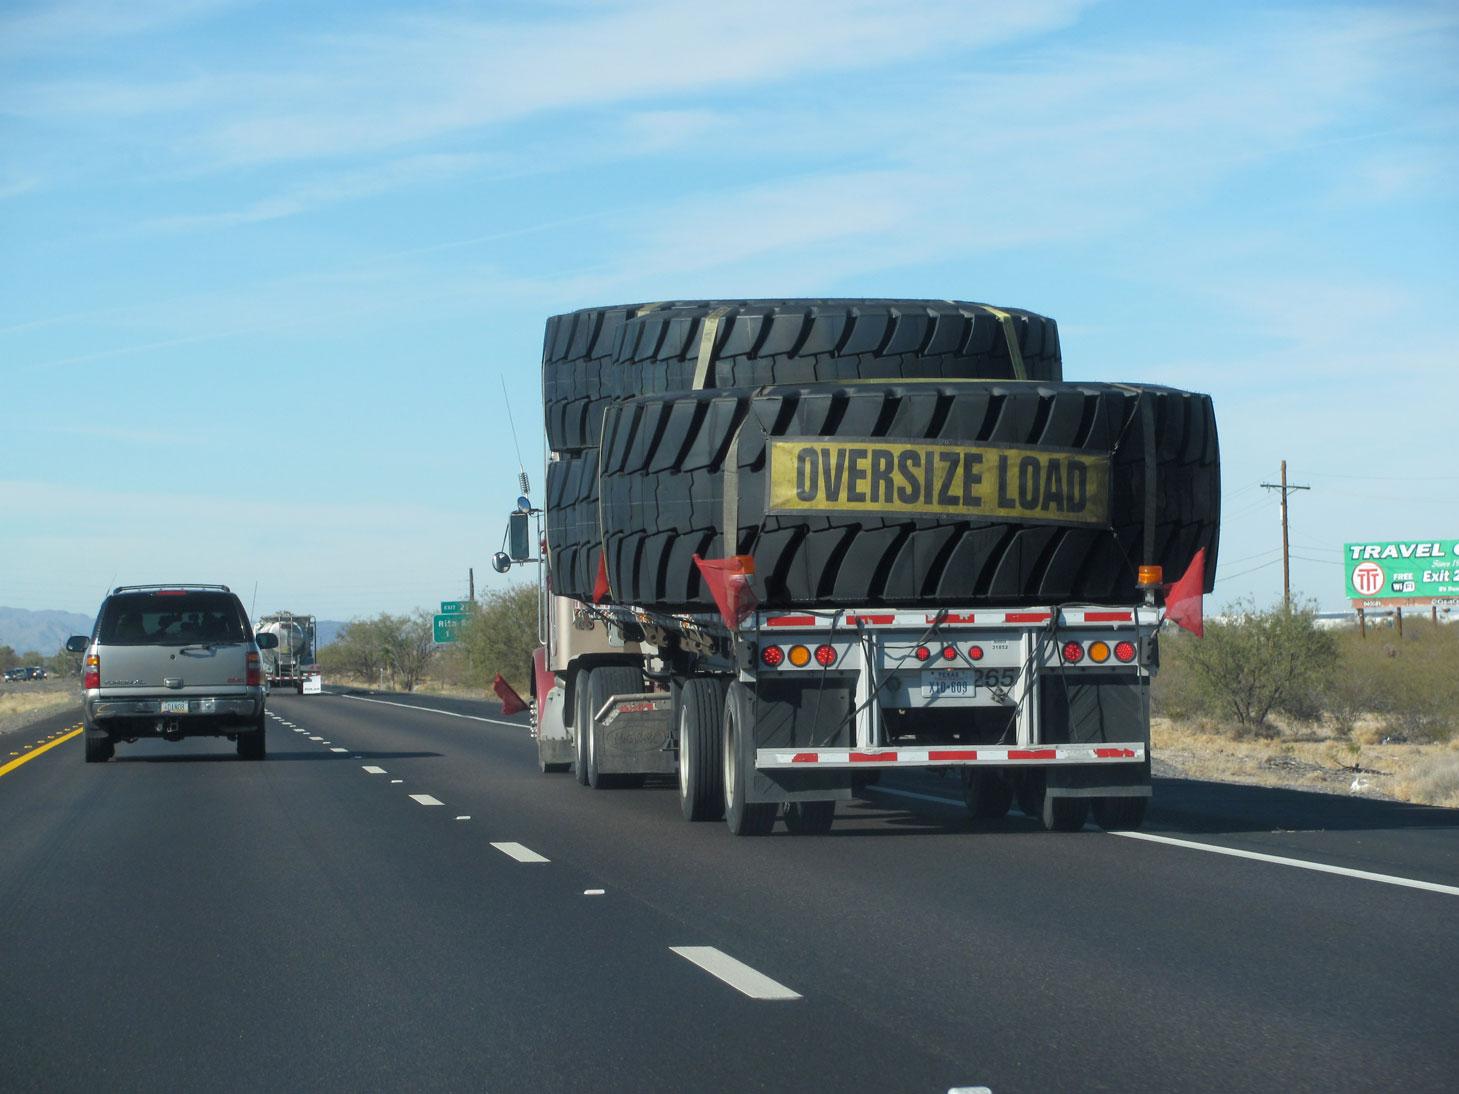 how big is the vehicle that uses those tires robert kaplinsky